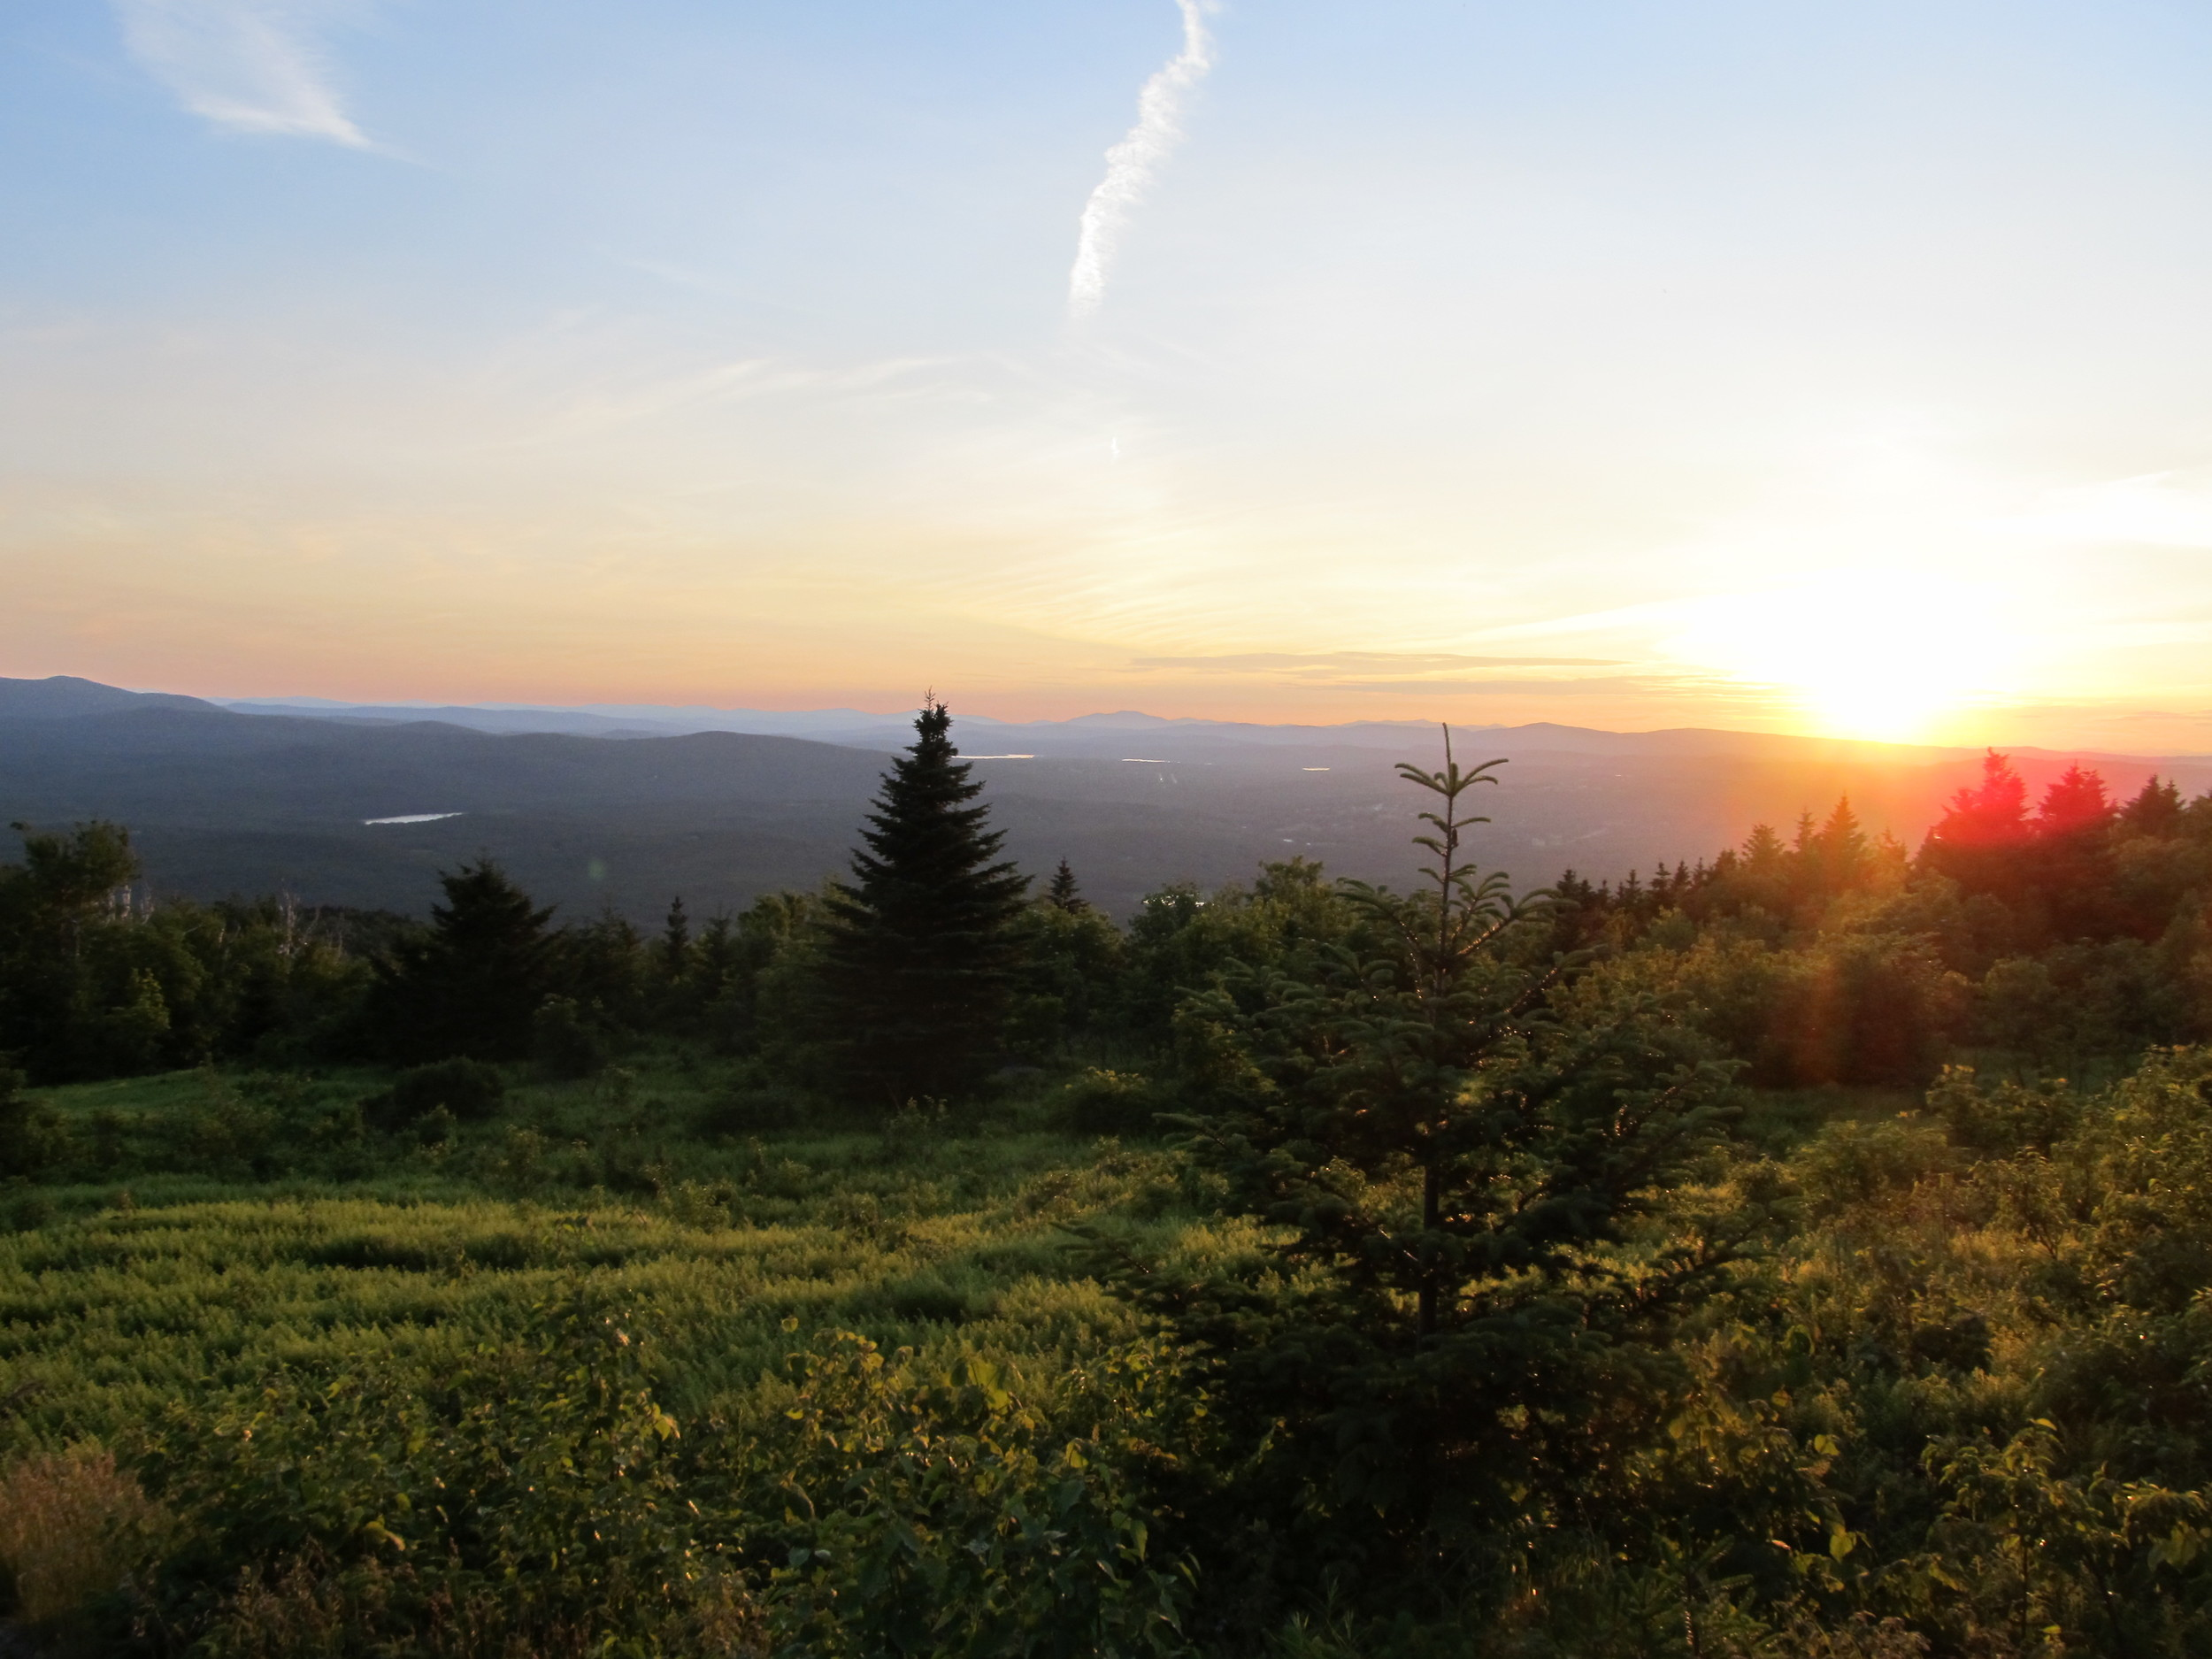 Sunset from Mt. Kearsarge